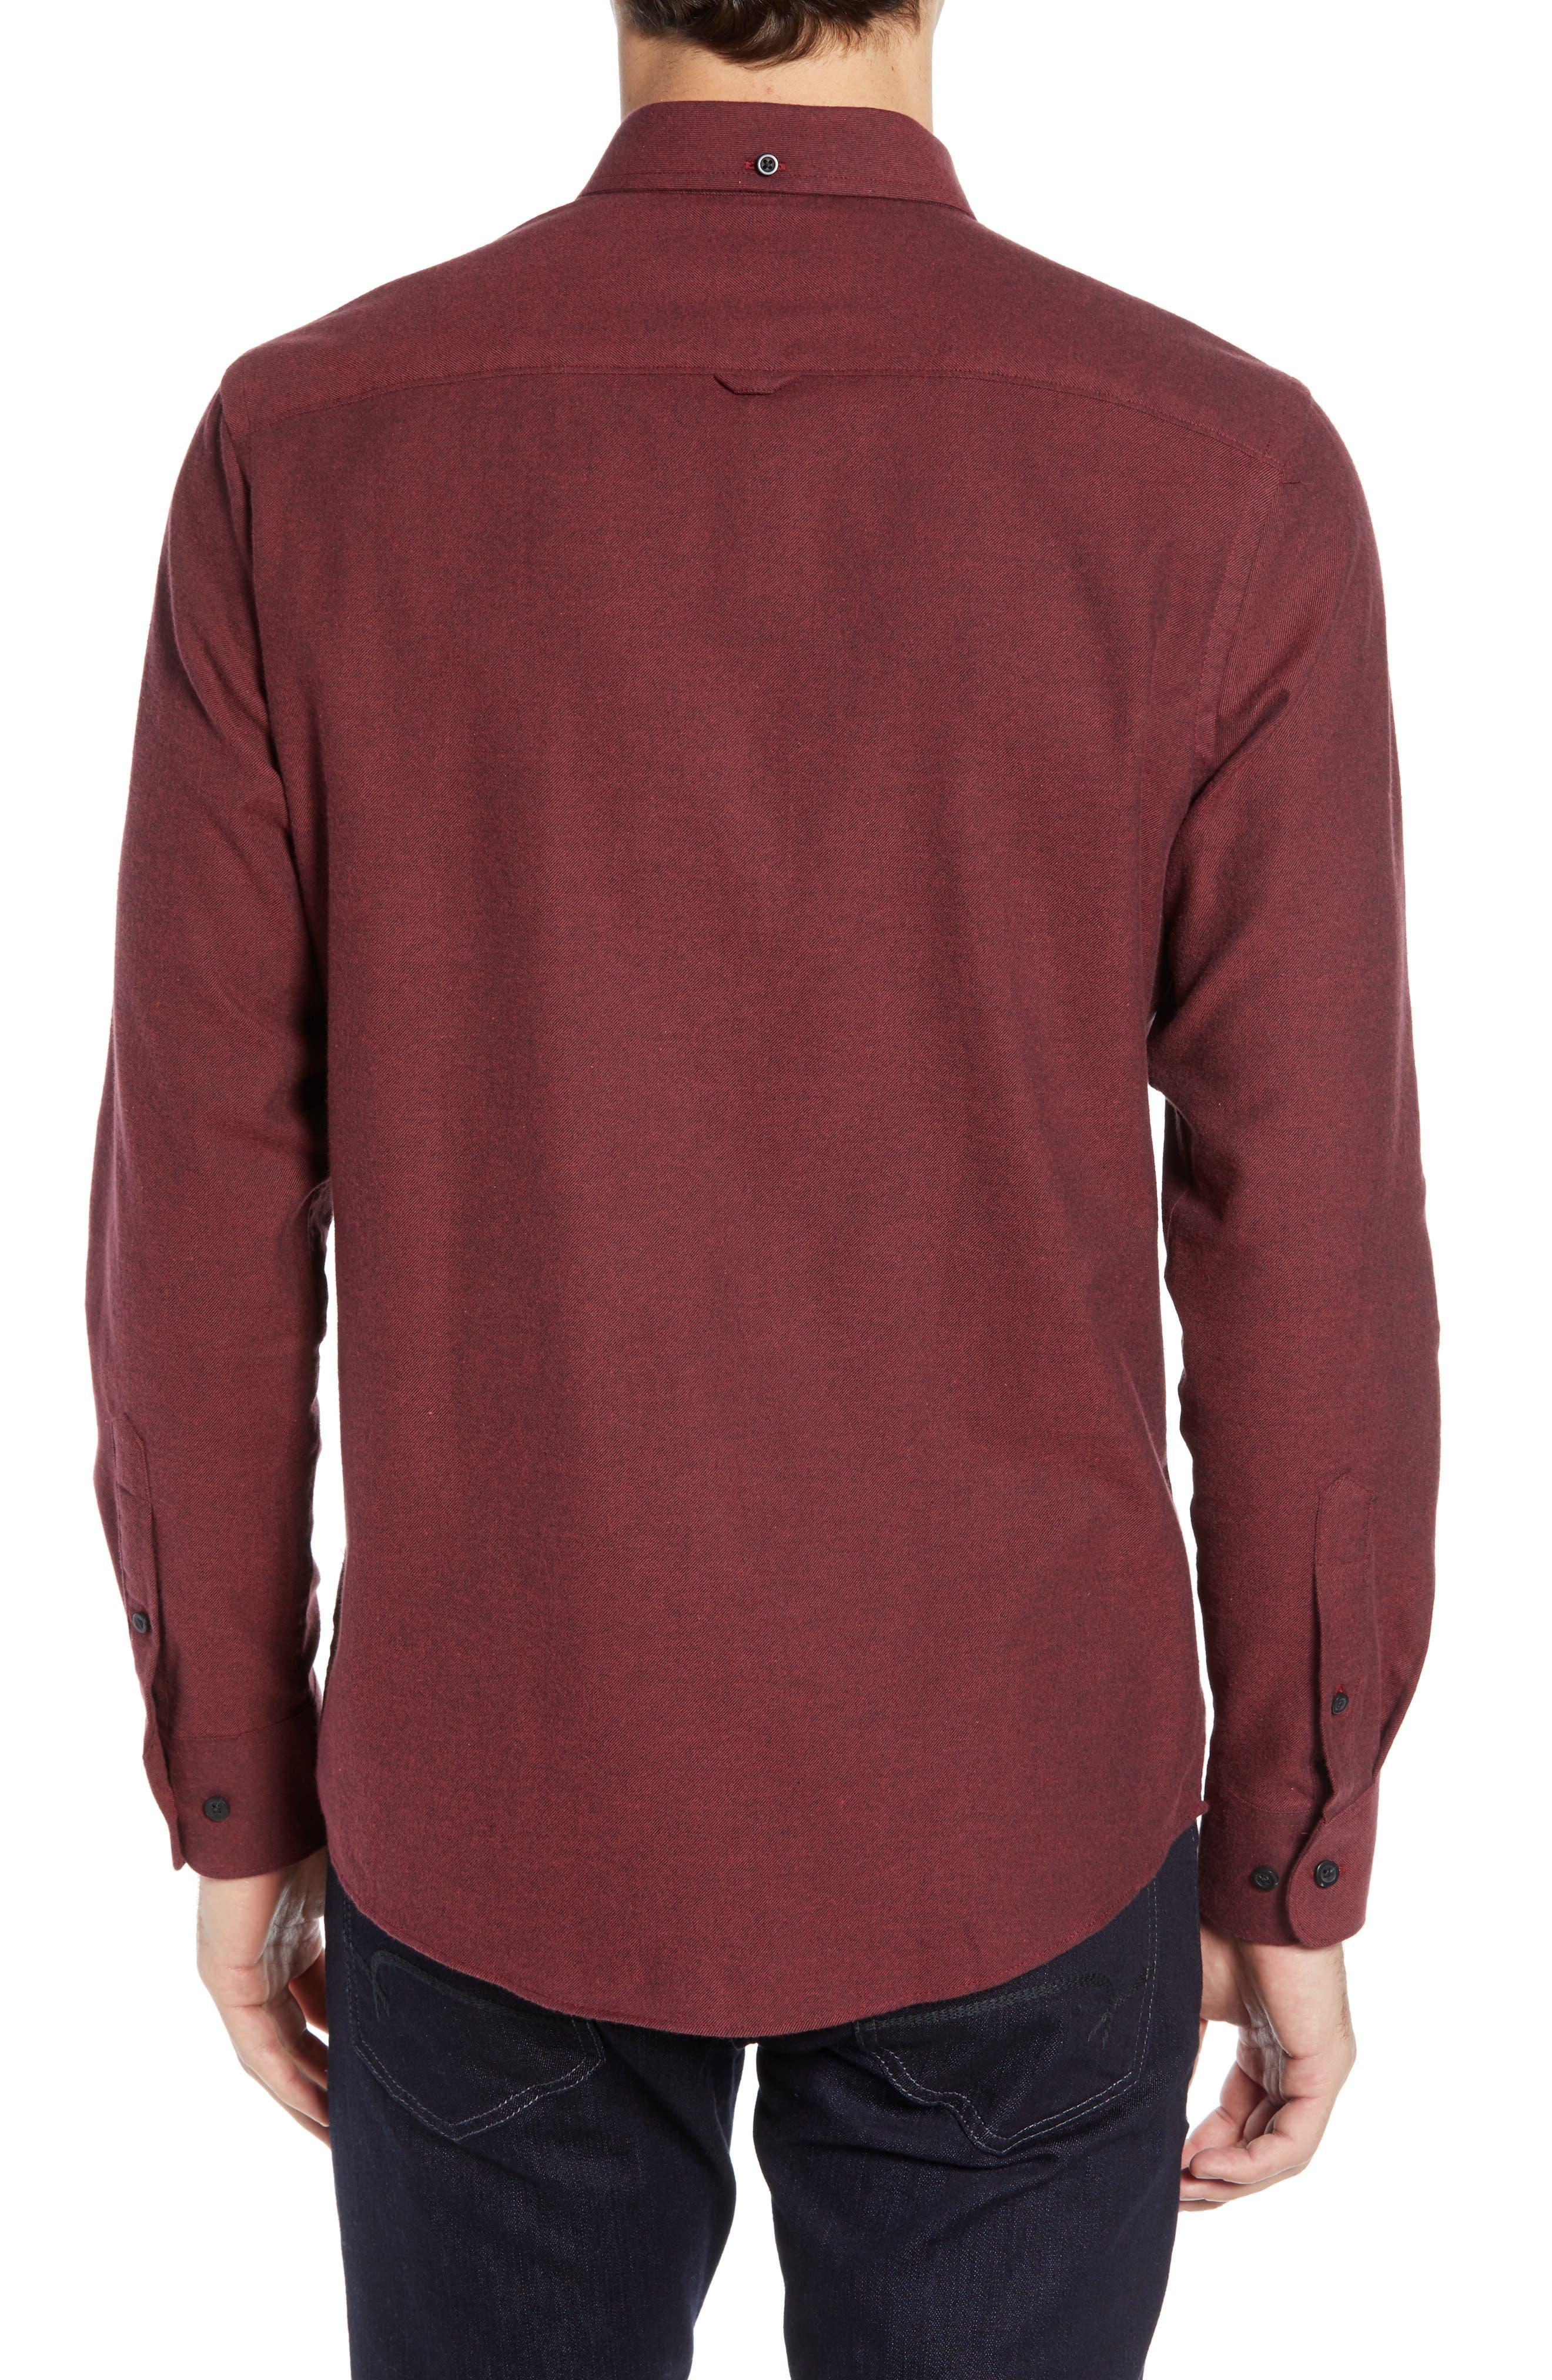 NORDSTROM MEN'S SHOP,                             Slim Fit Brushed Twill Sport Shirt,                             Alternate thumbnail 3, color,                             RED JESTER BRUSHED TWILL